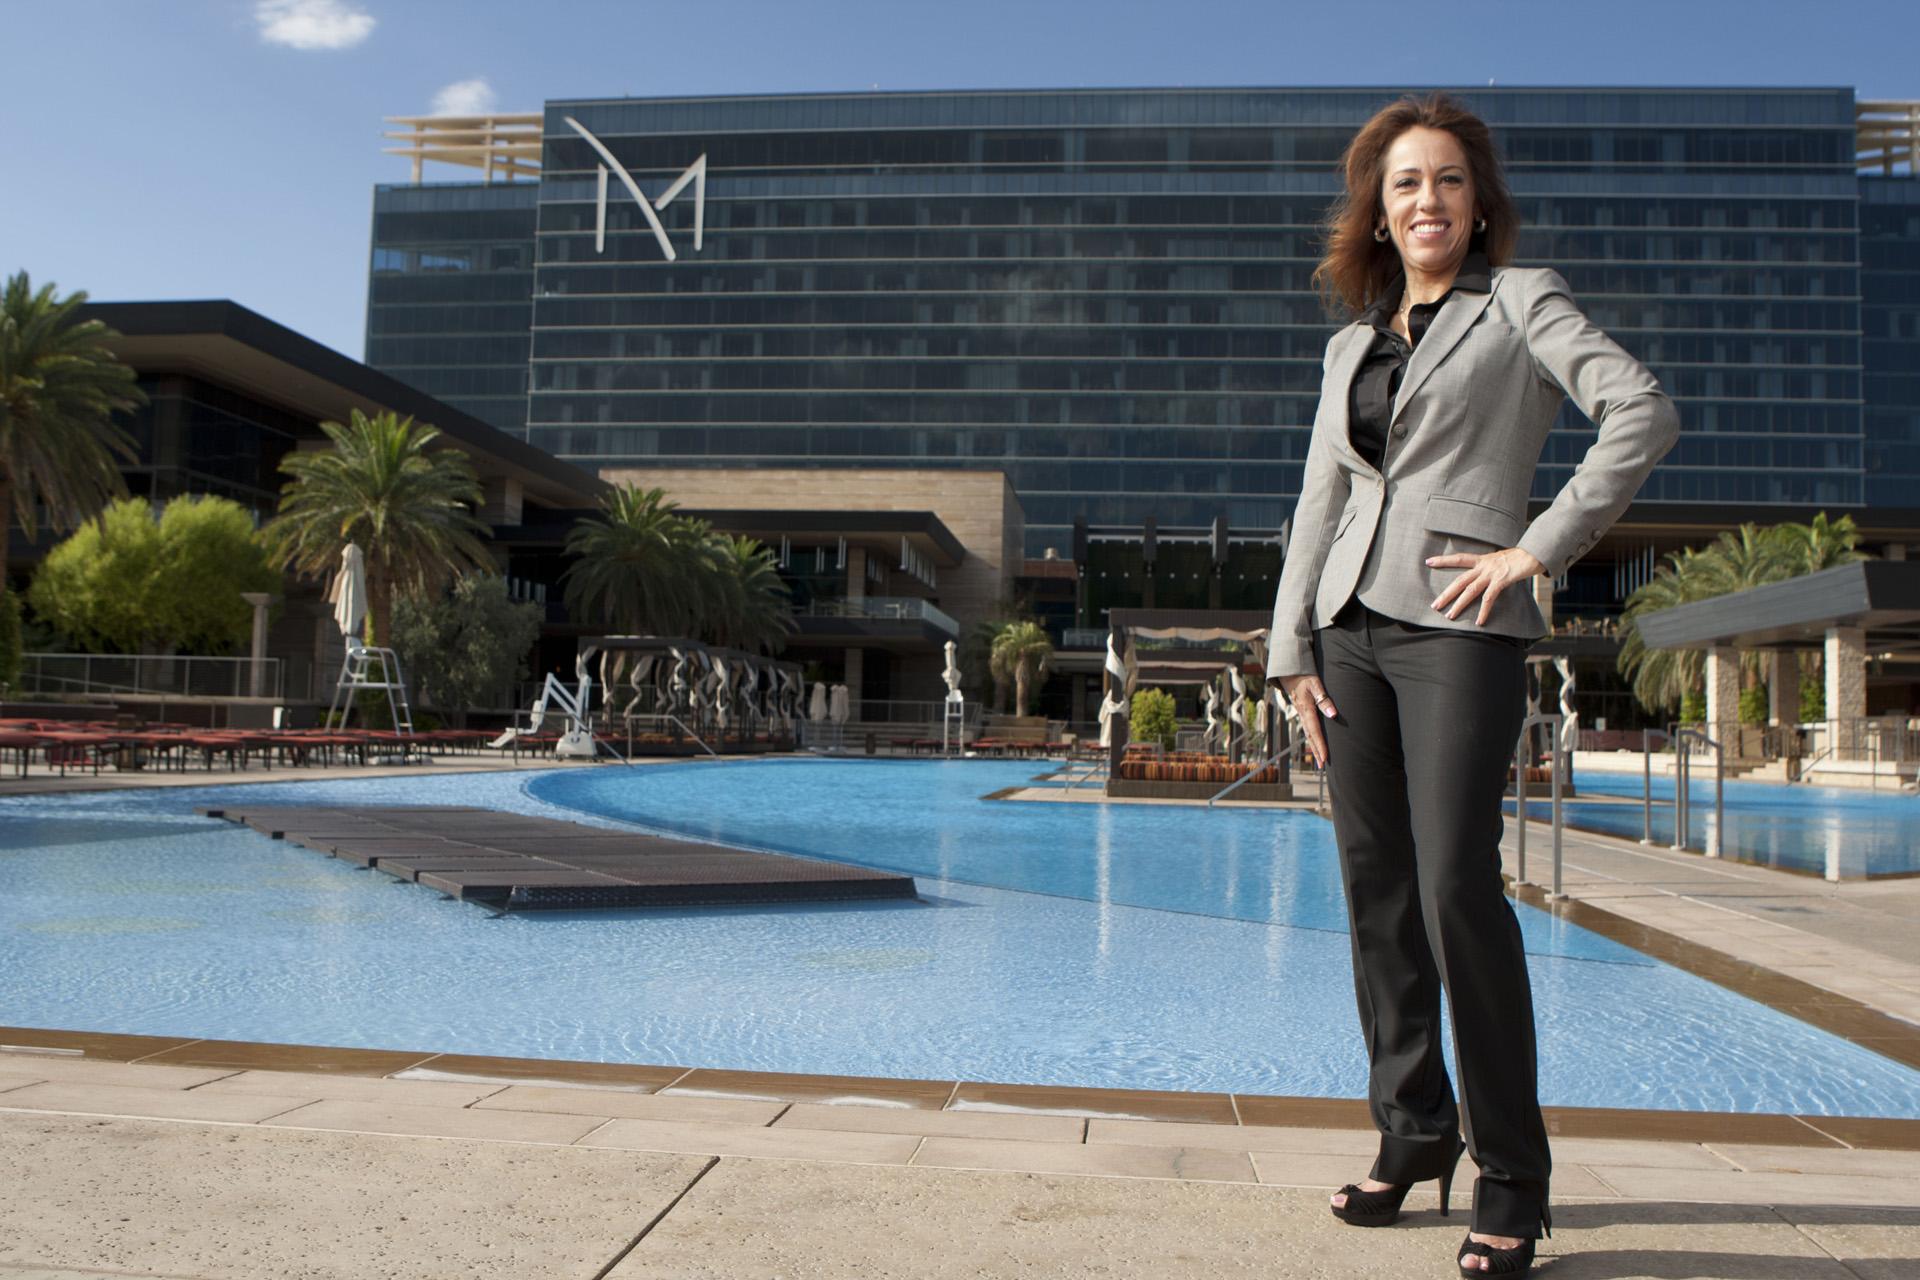 Policyholder Veronica Fuentes, Risk Managment at M Resort, Las Vegas.